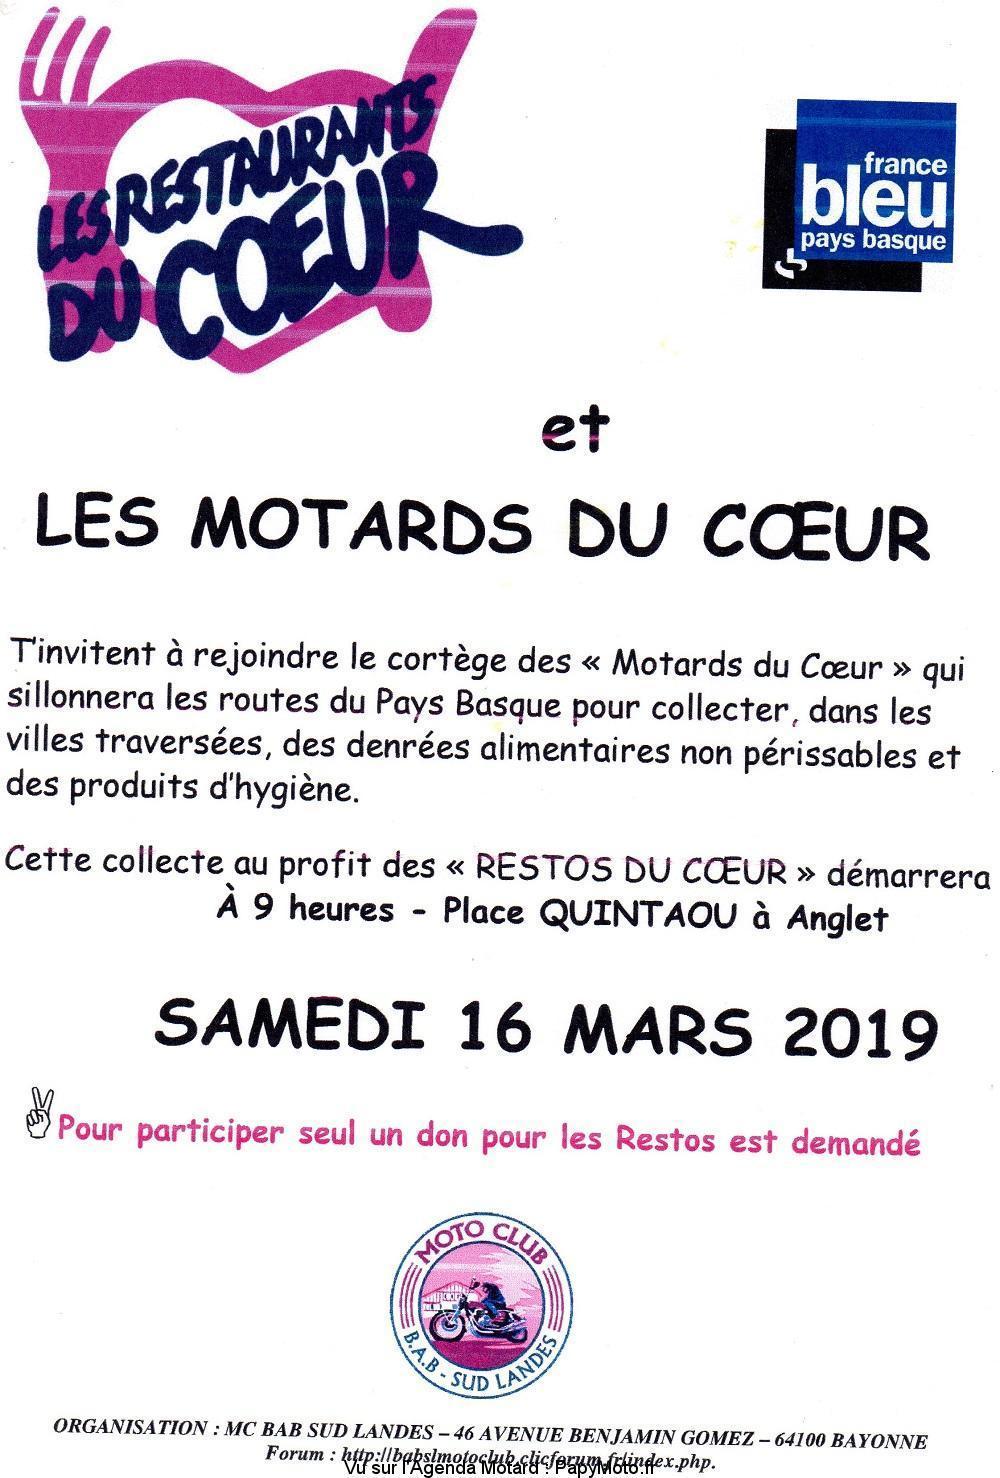 Les Motards du Coeur - Samedi 16 Mars 2019 - ANGLET (64) Balade59